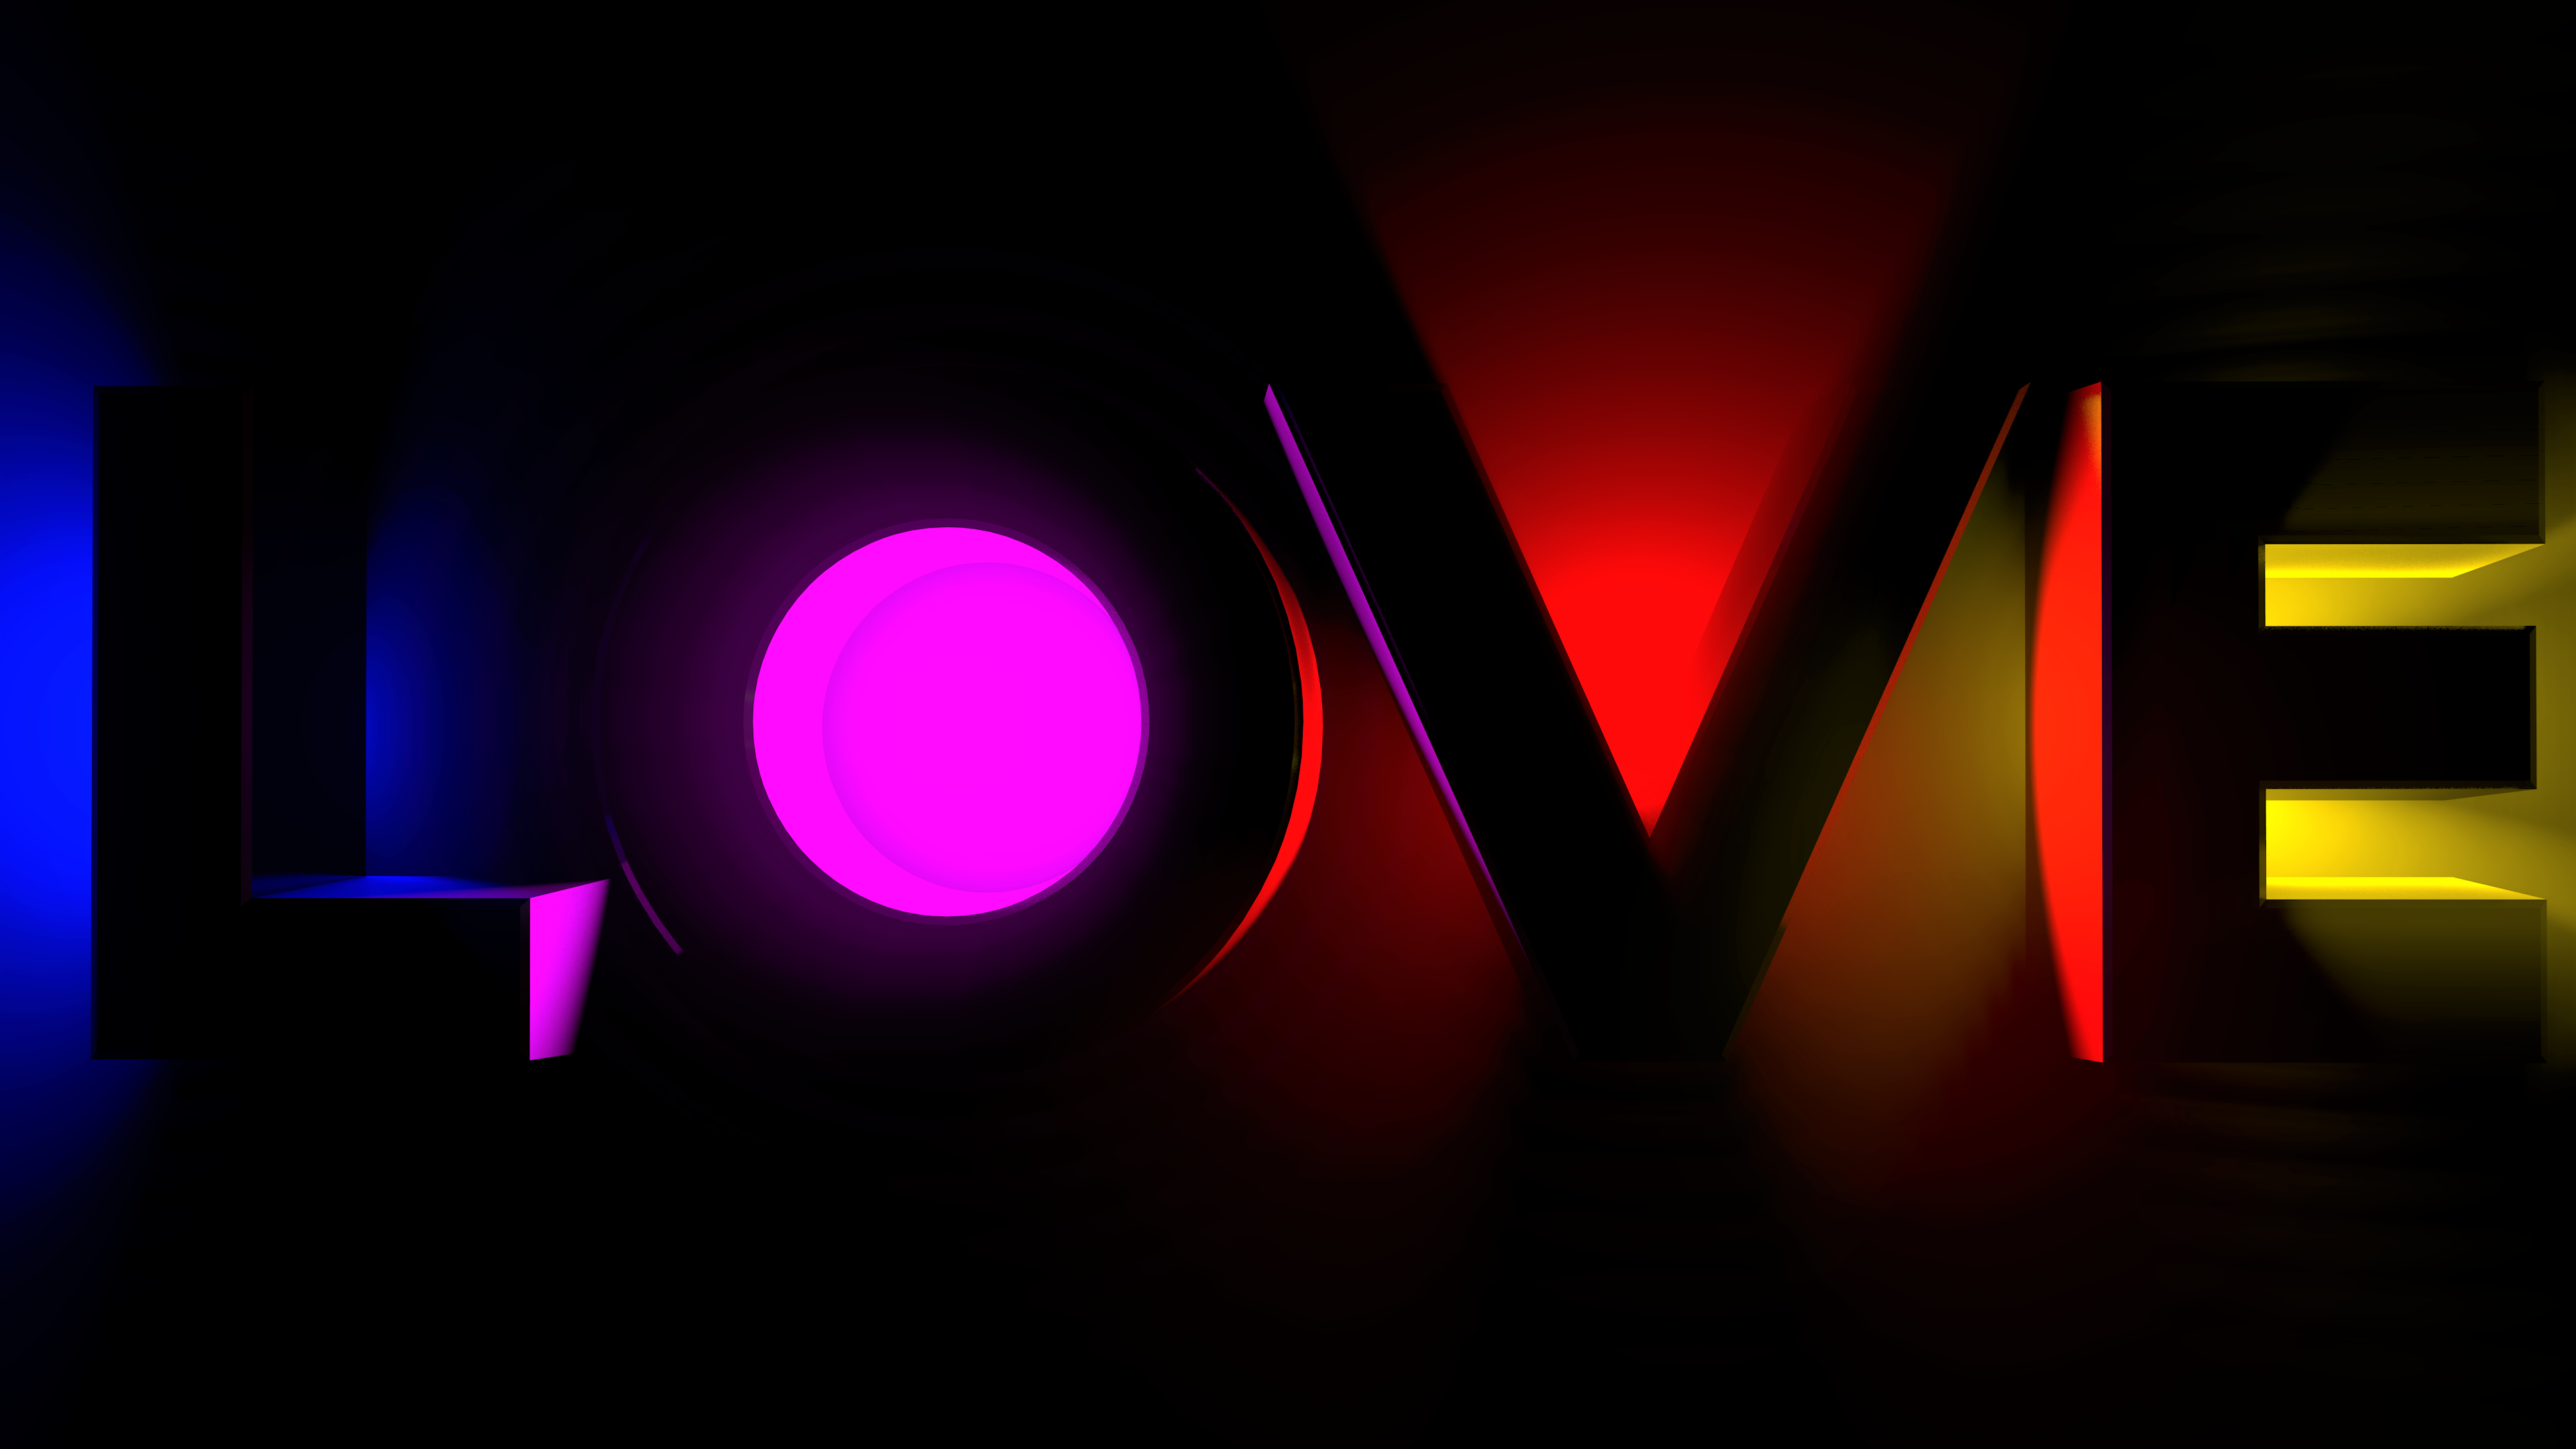 Neon Love 4k Ultra Hd Wallpaper Background Image 3840x2160 Id 937491 Wallpaper Abyss